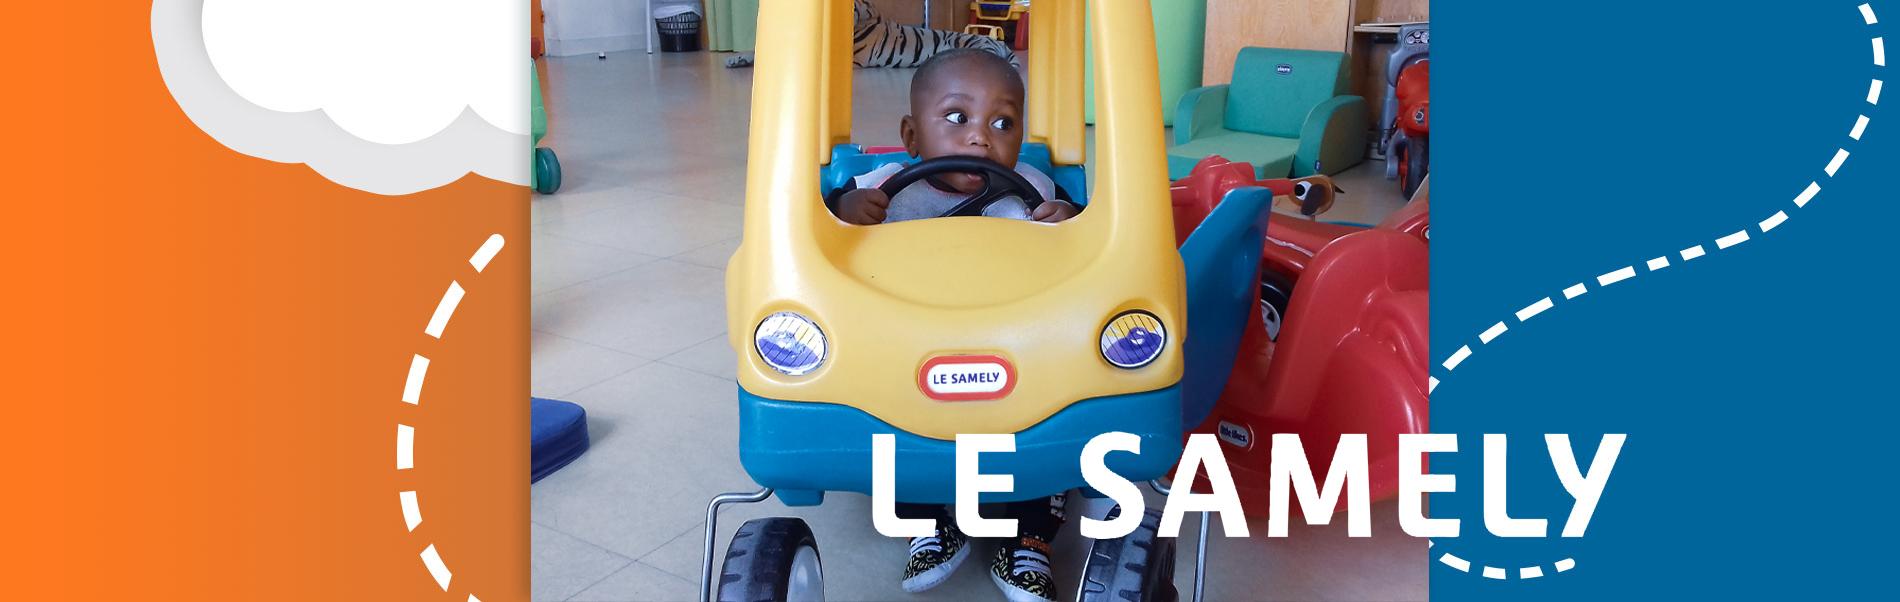 Le samely